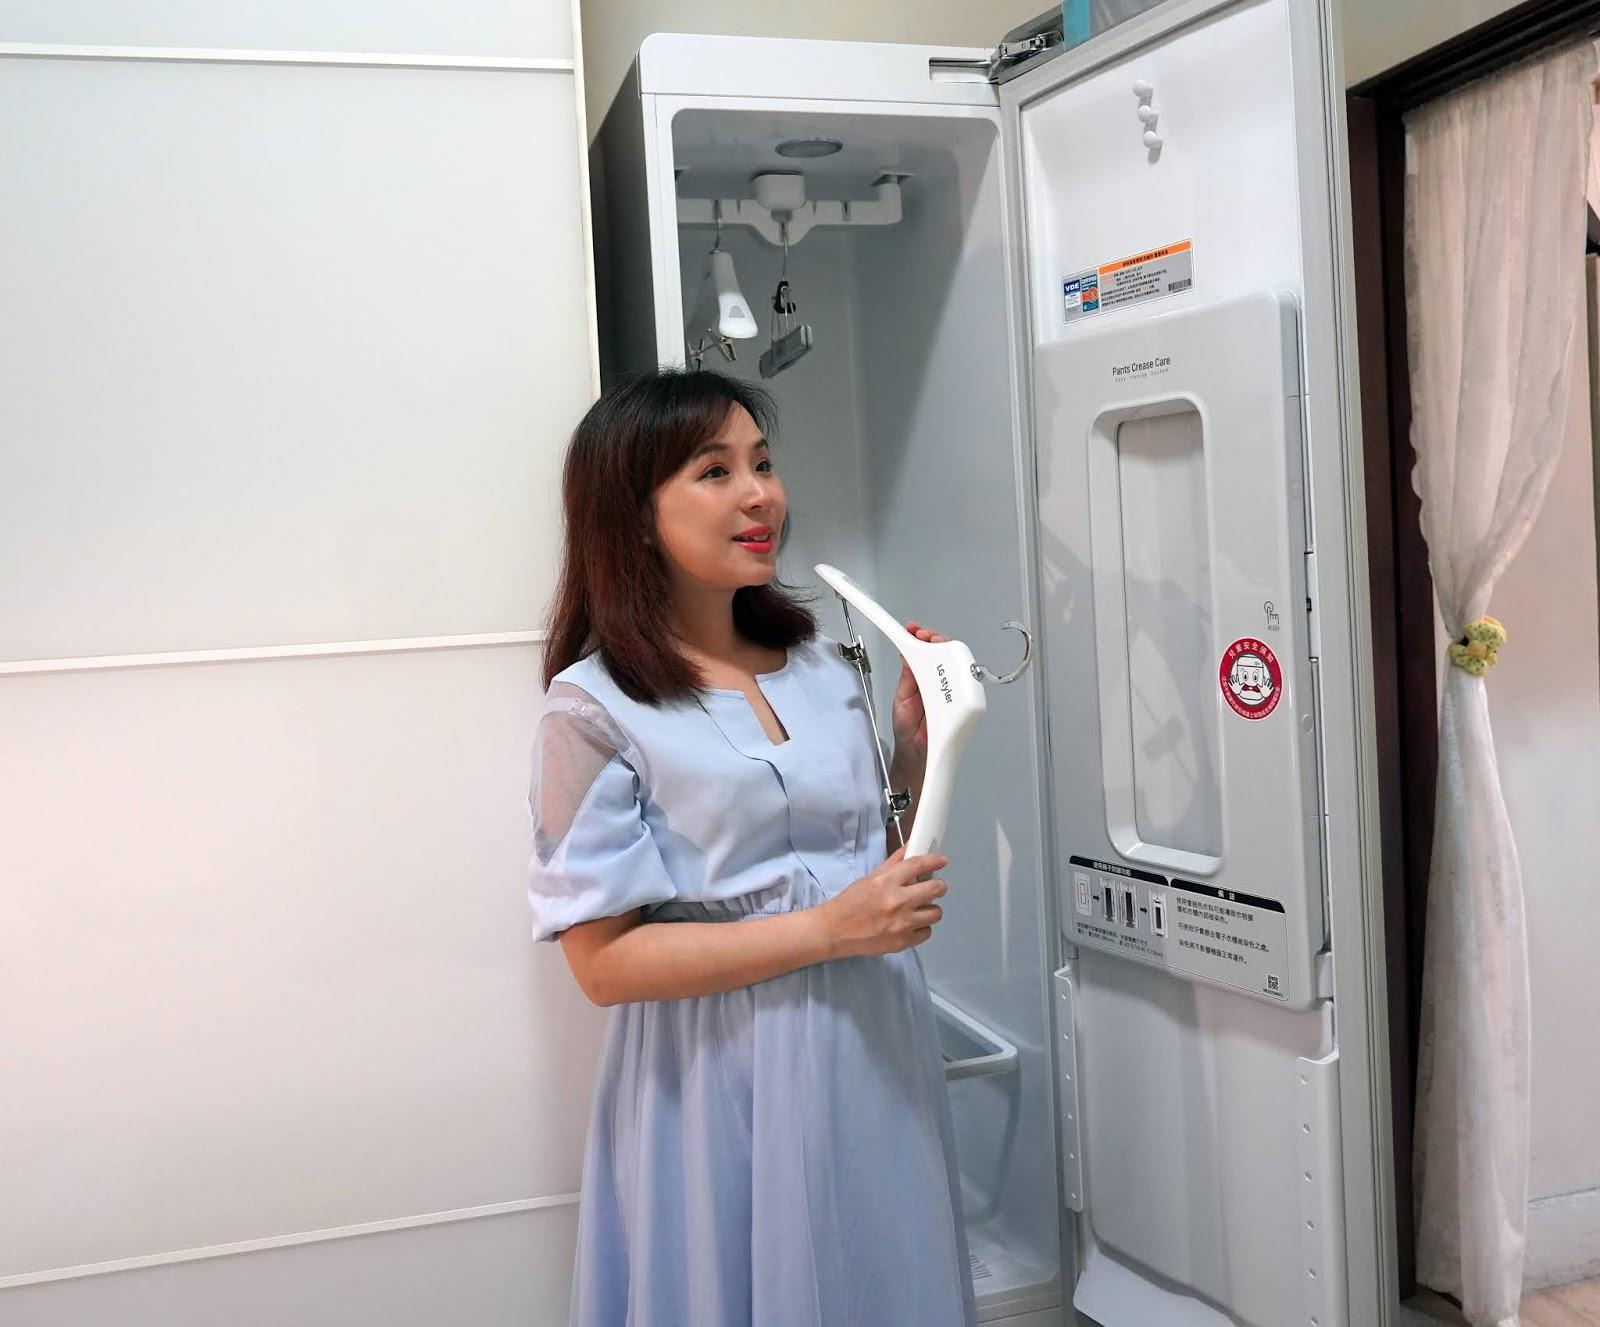 07_dj%25E7%2590%25A6%25E7%2590%25A6_wwwhostkikicom_LG.JPG-忙碌爸媽的救星,智慧電子衣櫥讓你輕鬆進行衣物清潔殺菌